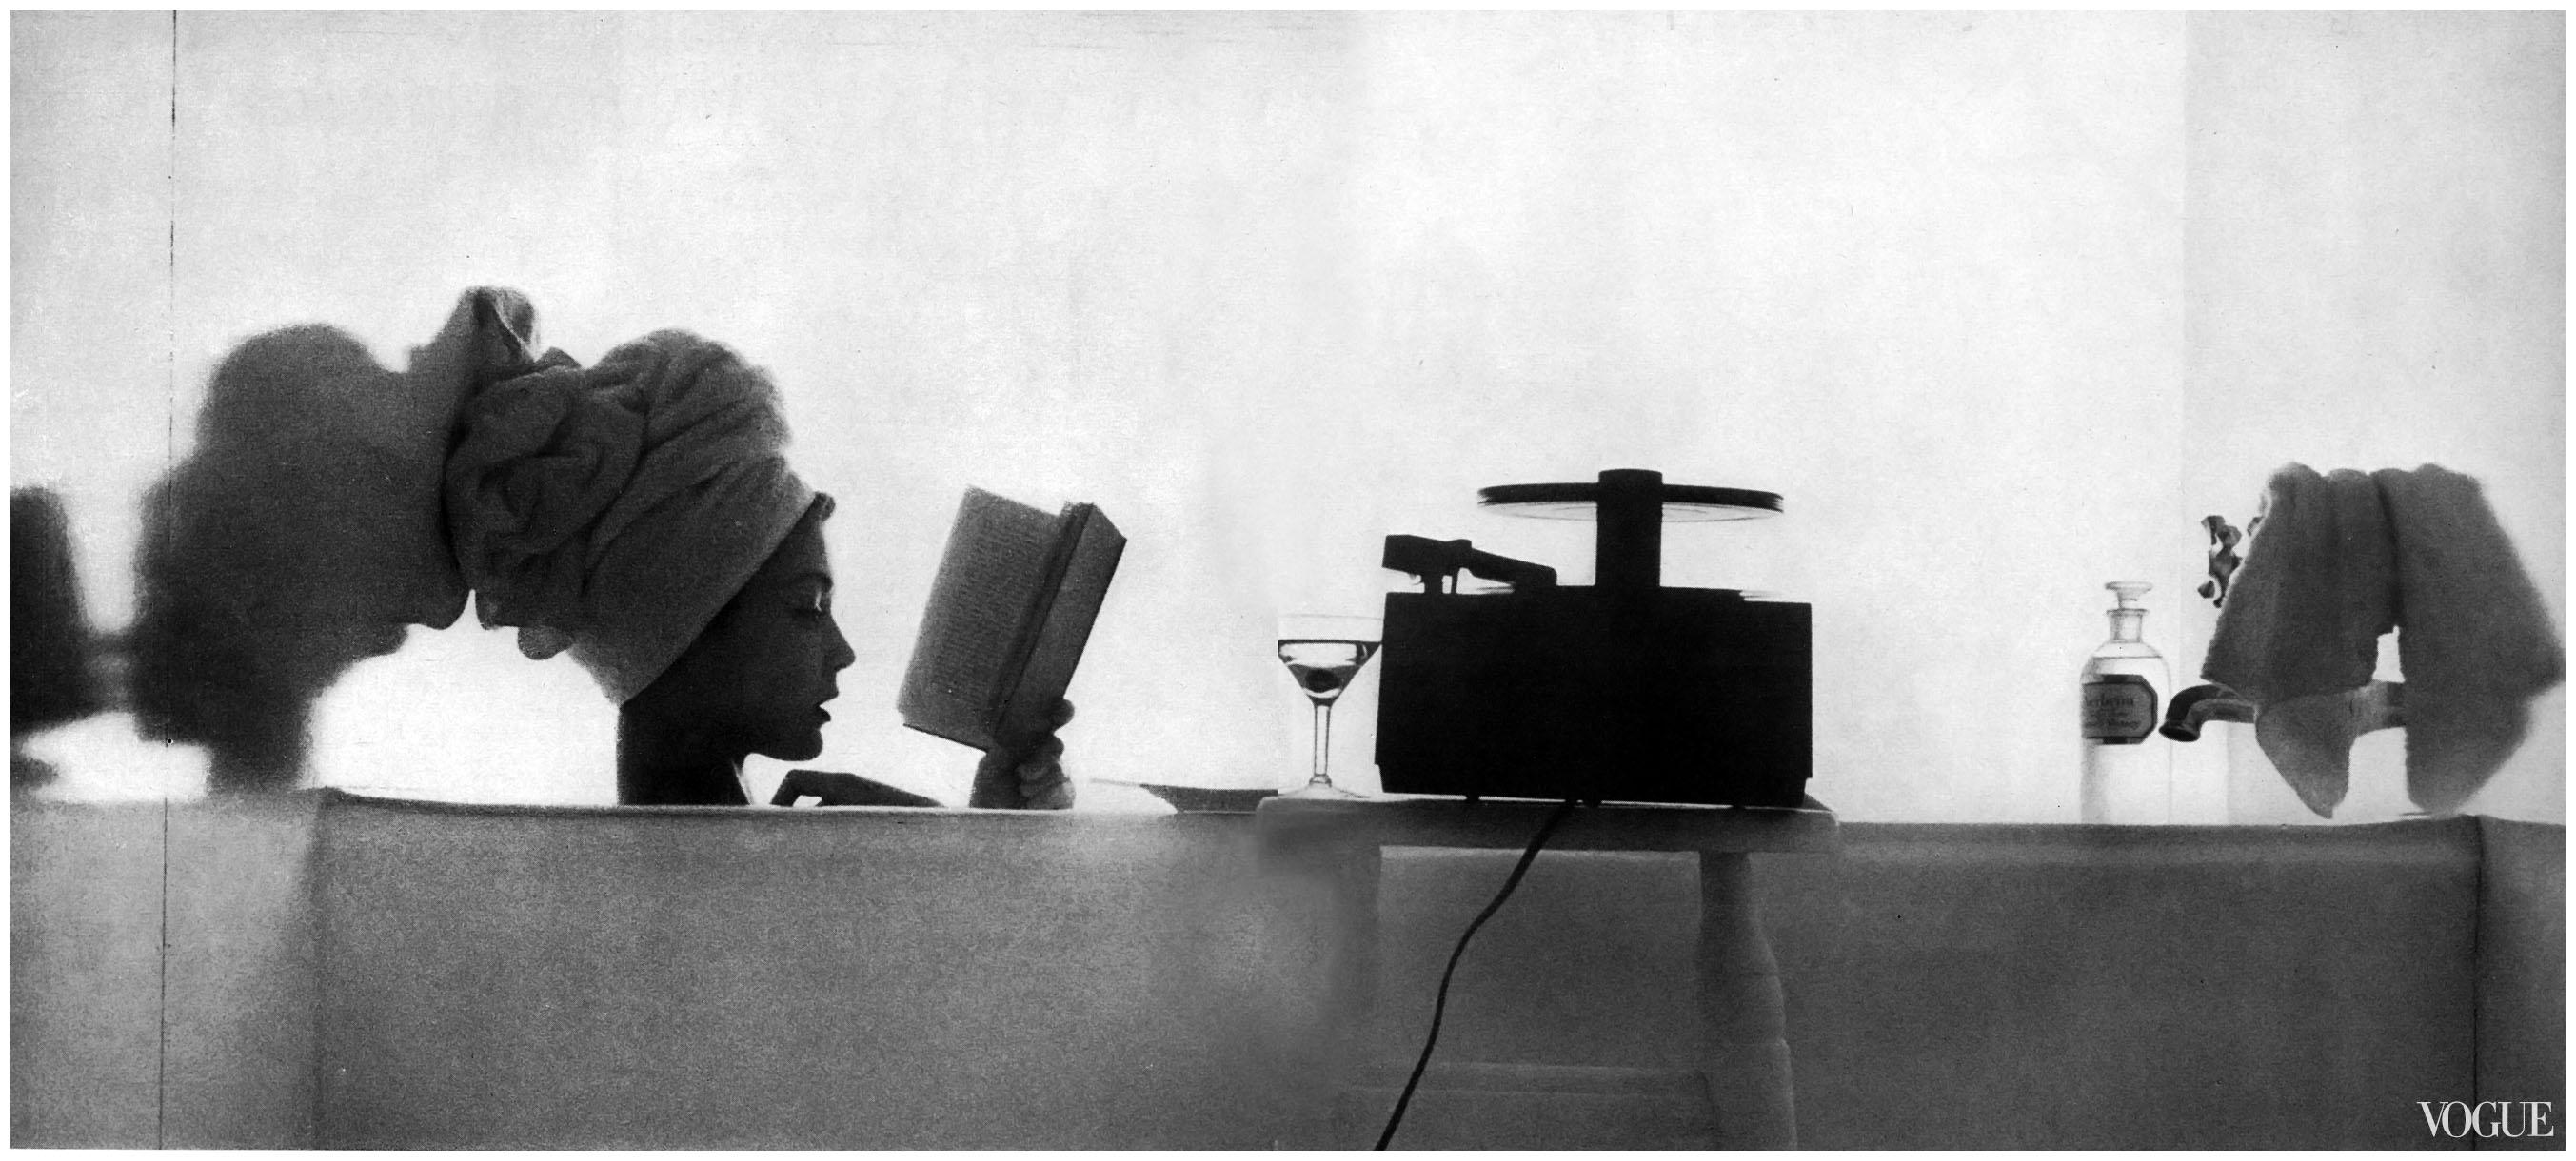 jean-patchett-photo-irving-penn-vogue-june-1-1950